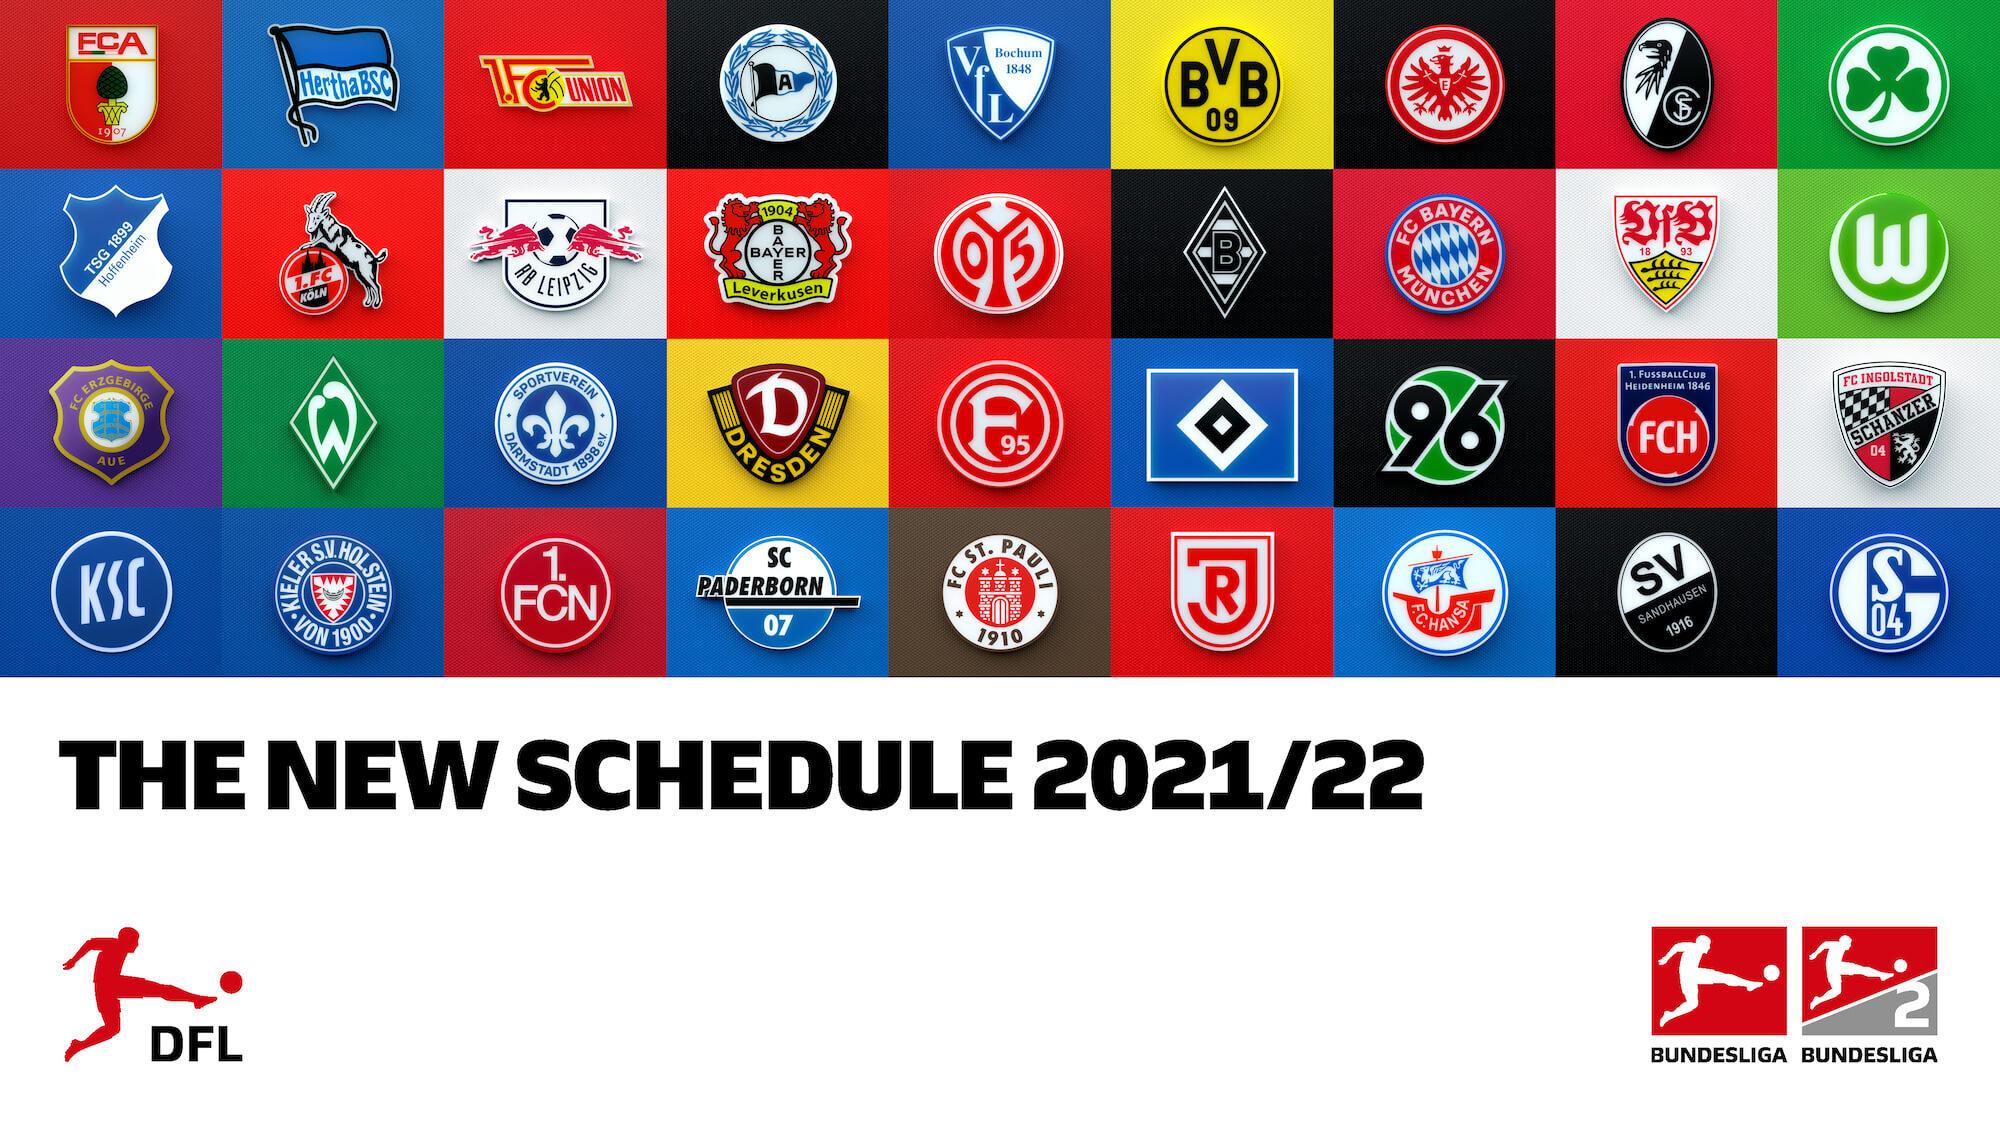 Bundesliga Borussia Monchengladbach Against Bayern Munich To Kick Off The 59th Bundesliga Season Bundesliga 2 Starts With Schalke Against Hamburg